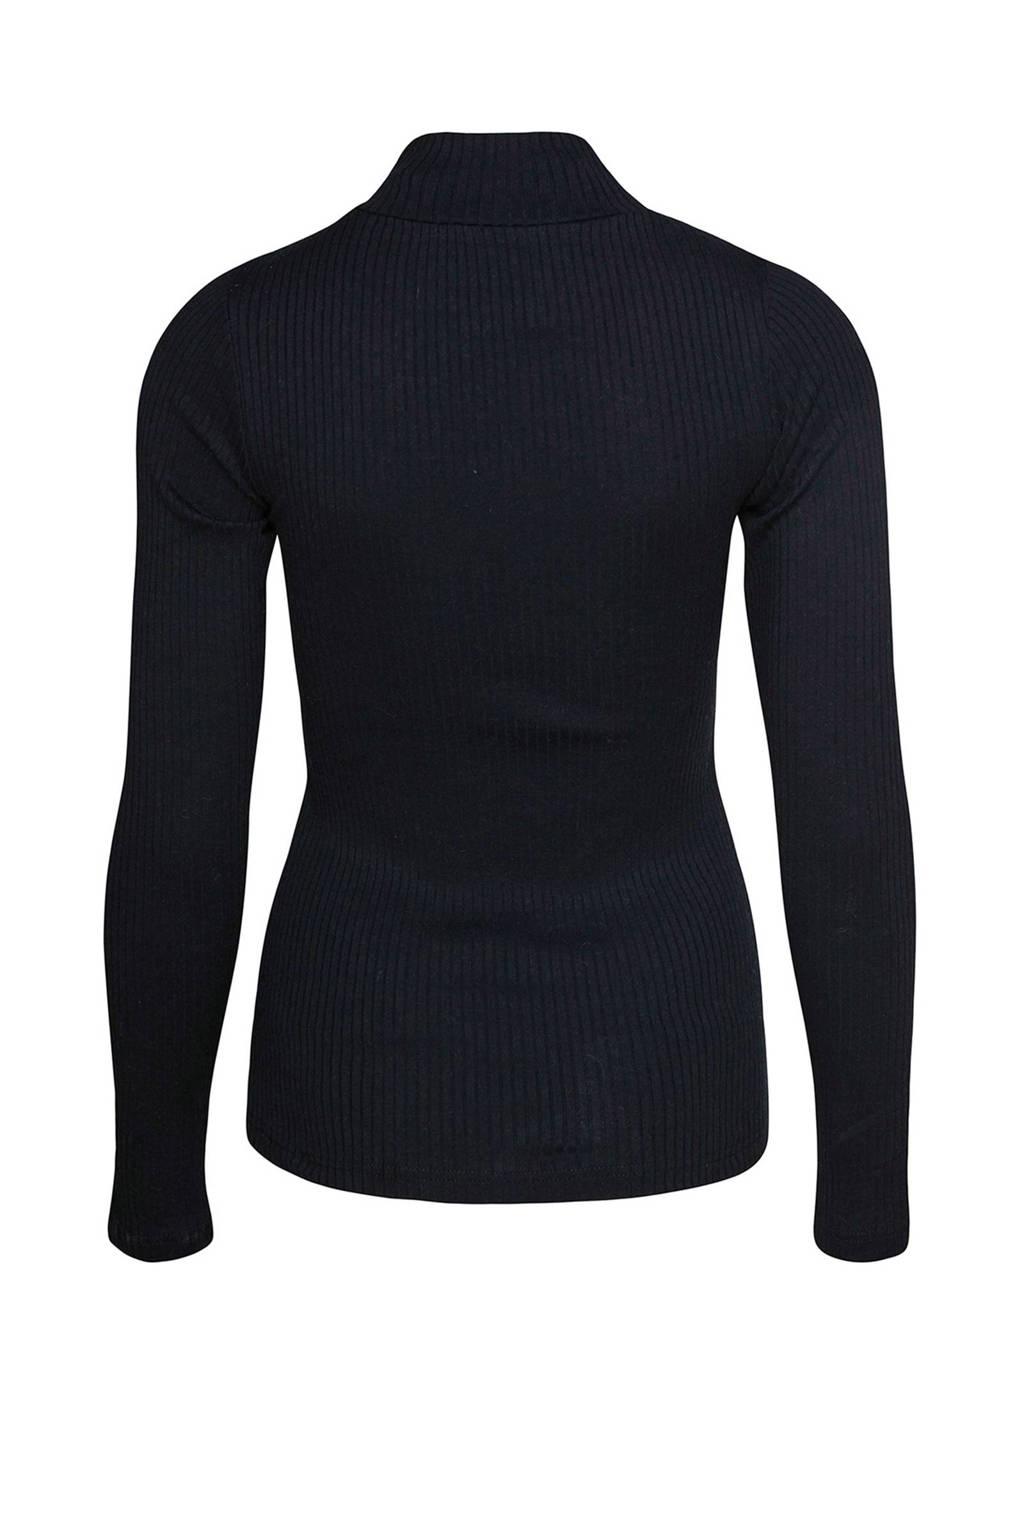 Sissy-Boy T-shirt, Zwart